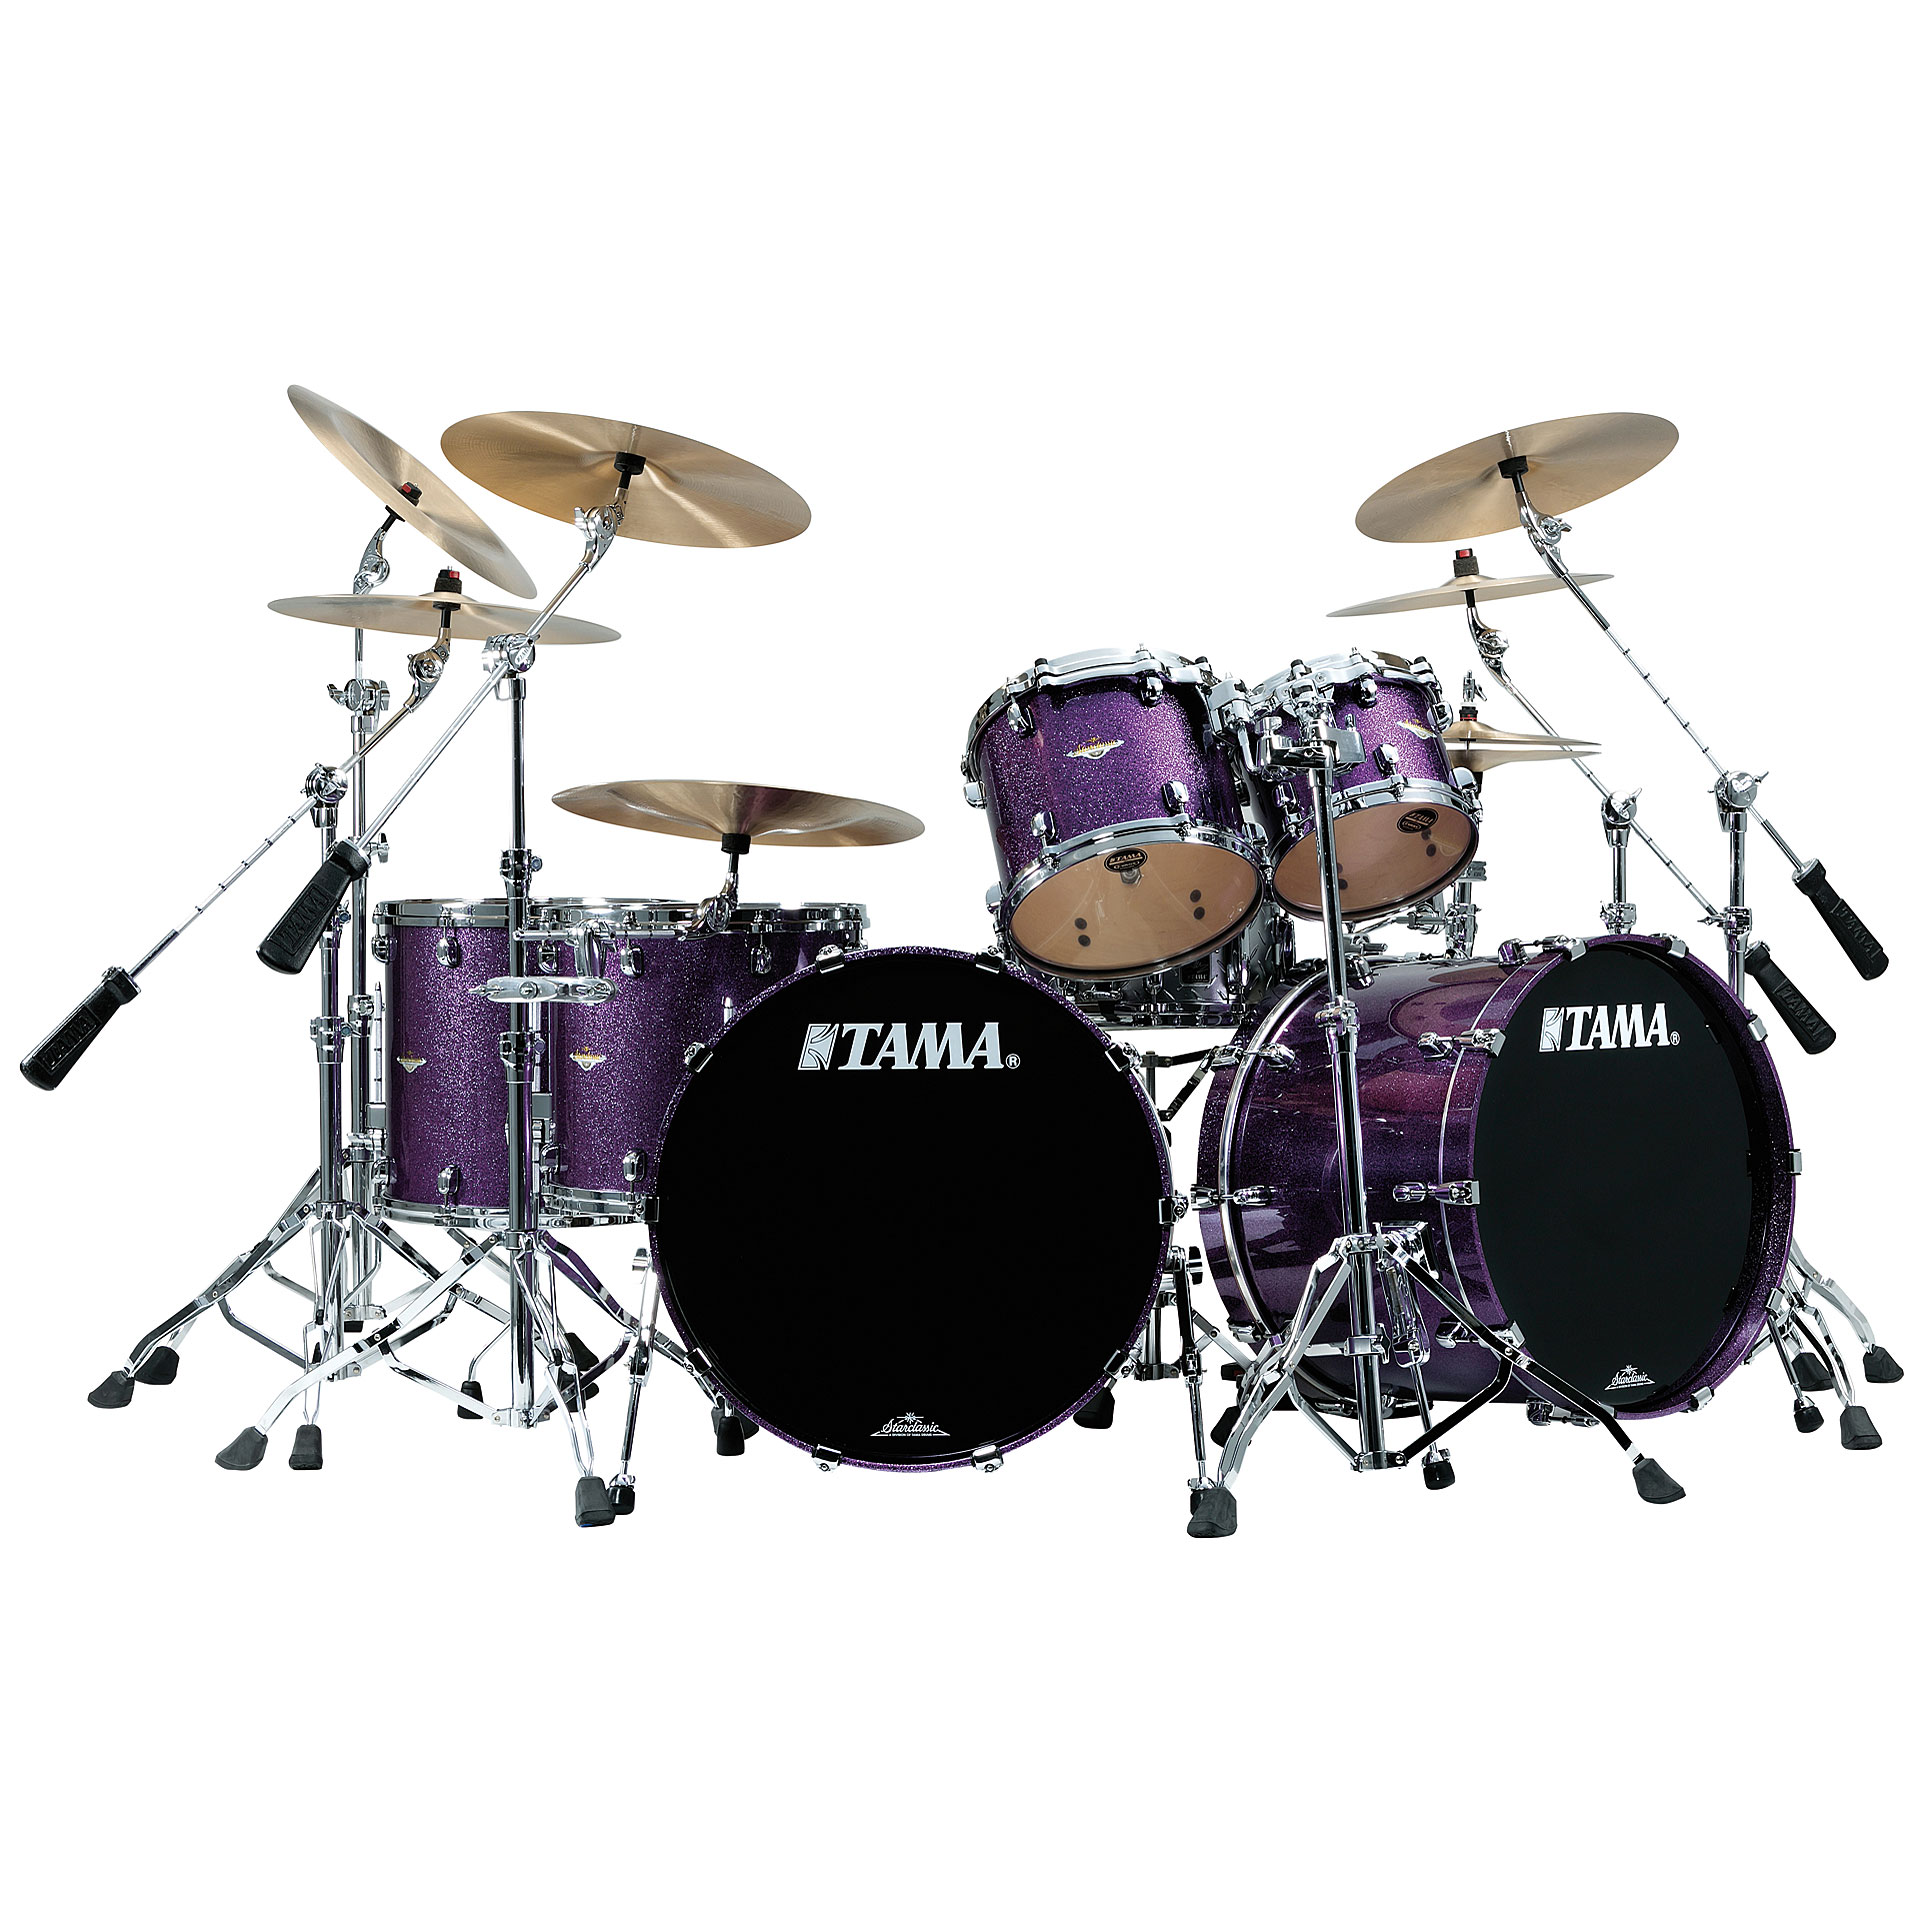 tama starclassic maple lars ulrich the worldwired drum kit. Black Bedroom Furniture Sets. Home Design Ideas